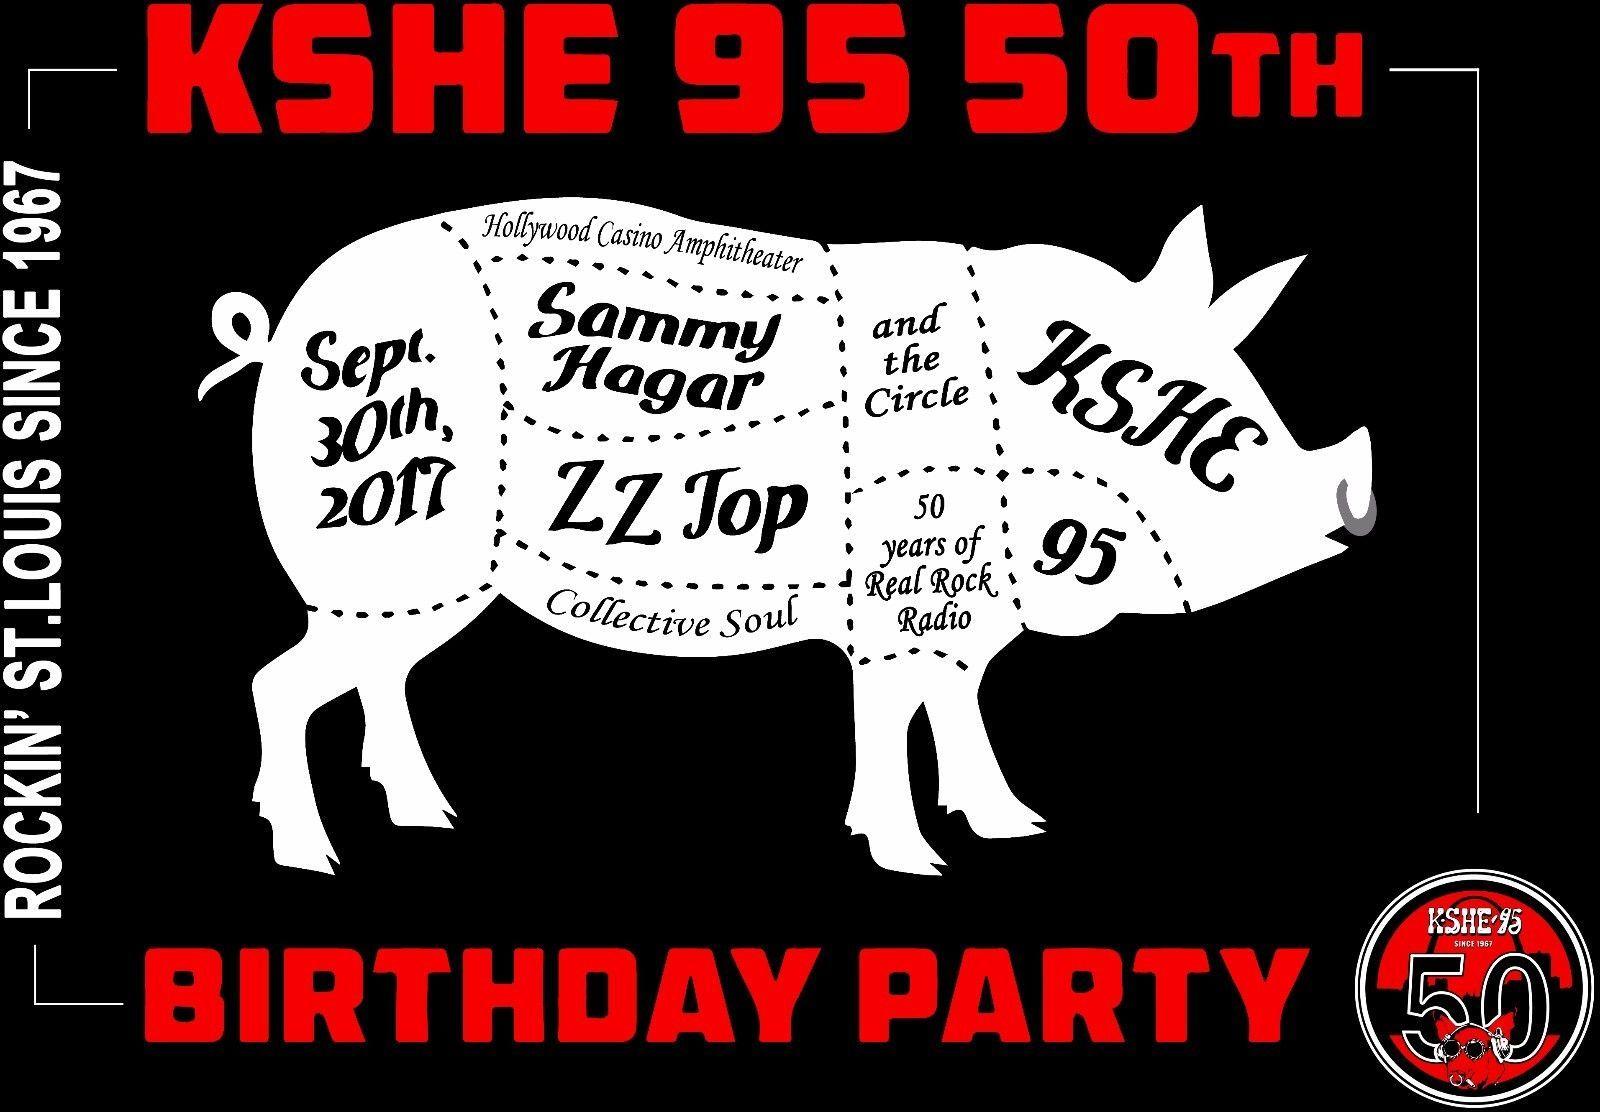 Kshe 95 Radio Rock Logo Tour 50th Anniversary Sammy Hagar Zz Top Tshirt S To 3xl Collective Soul Hollywood Casino Yoda